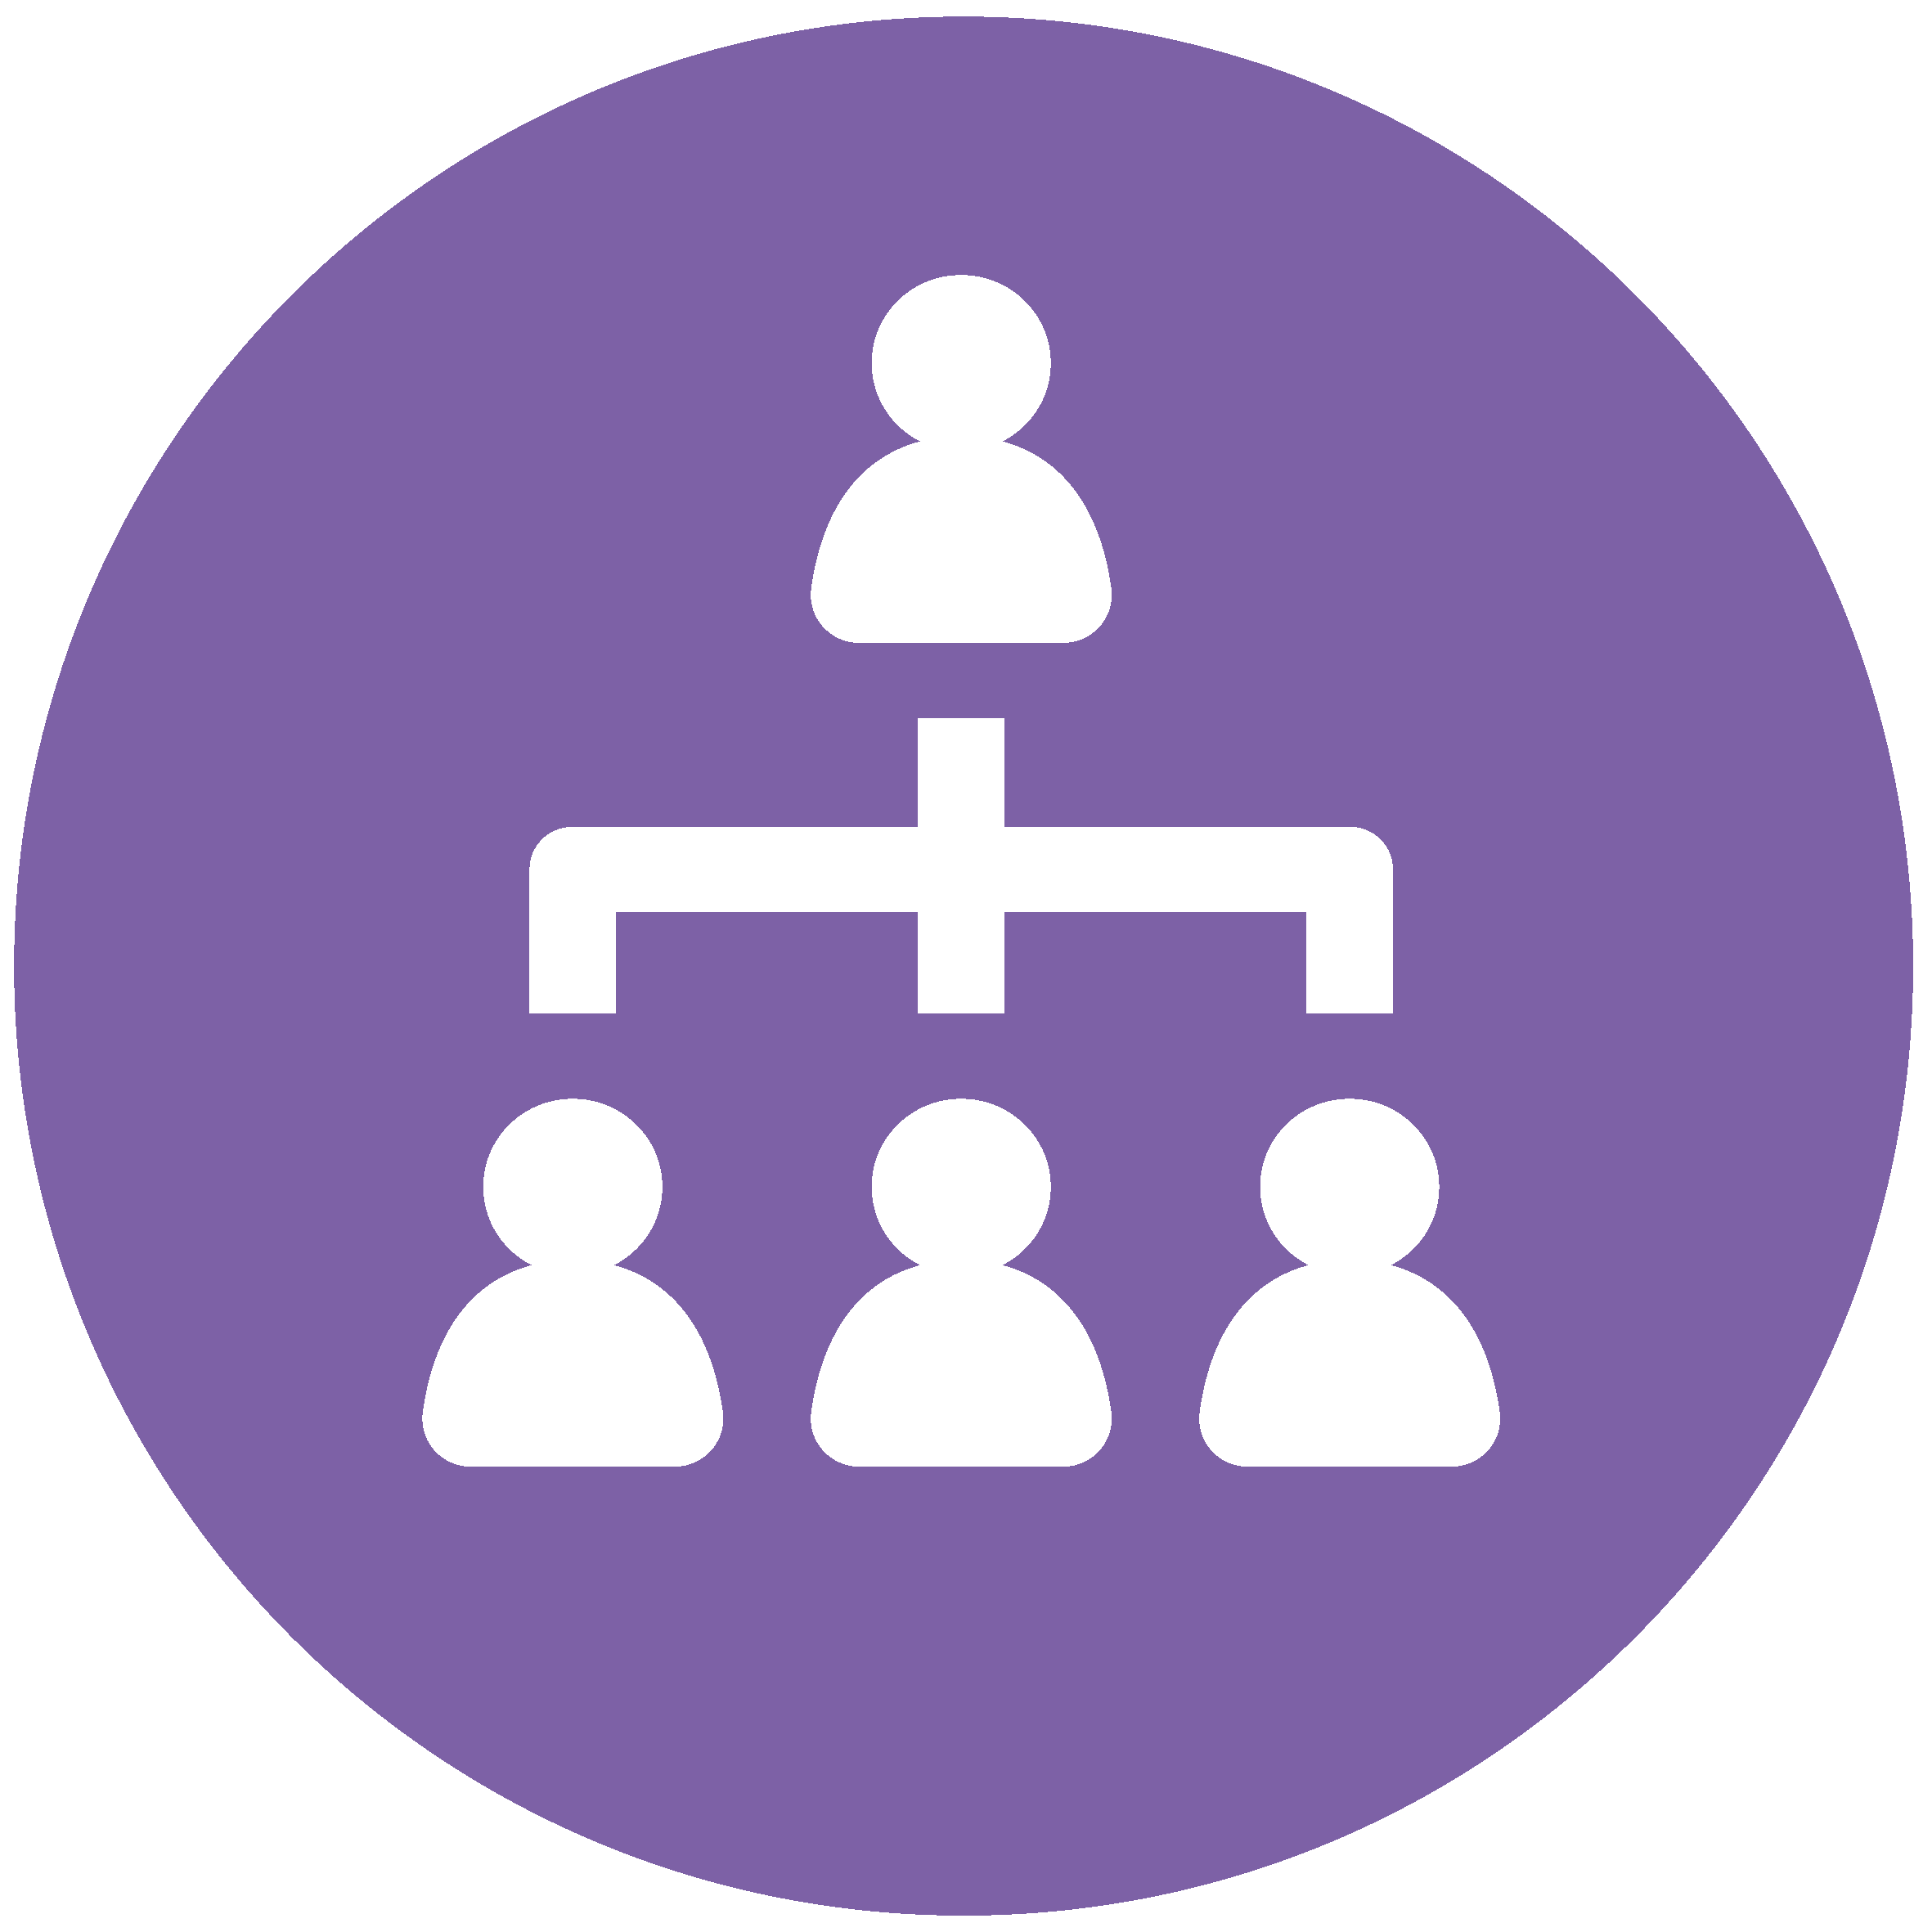 Organisation design & governance graphic